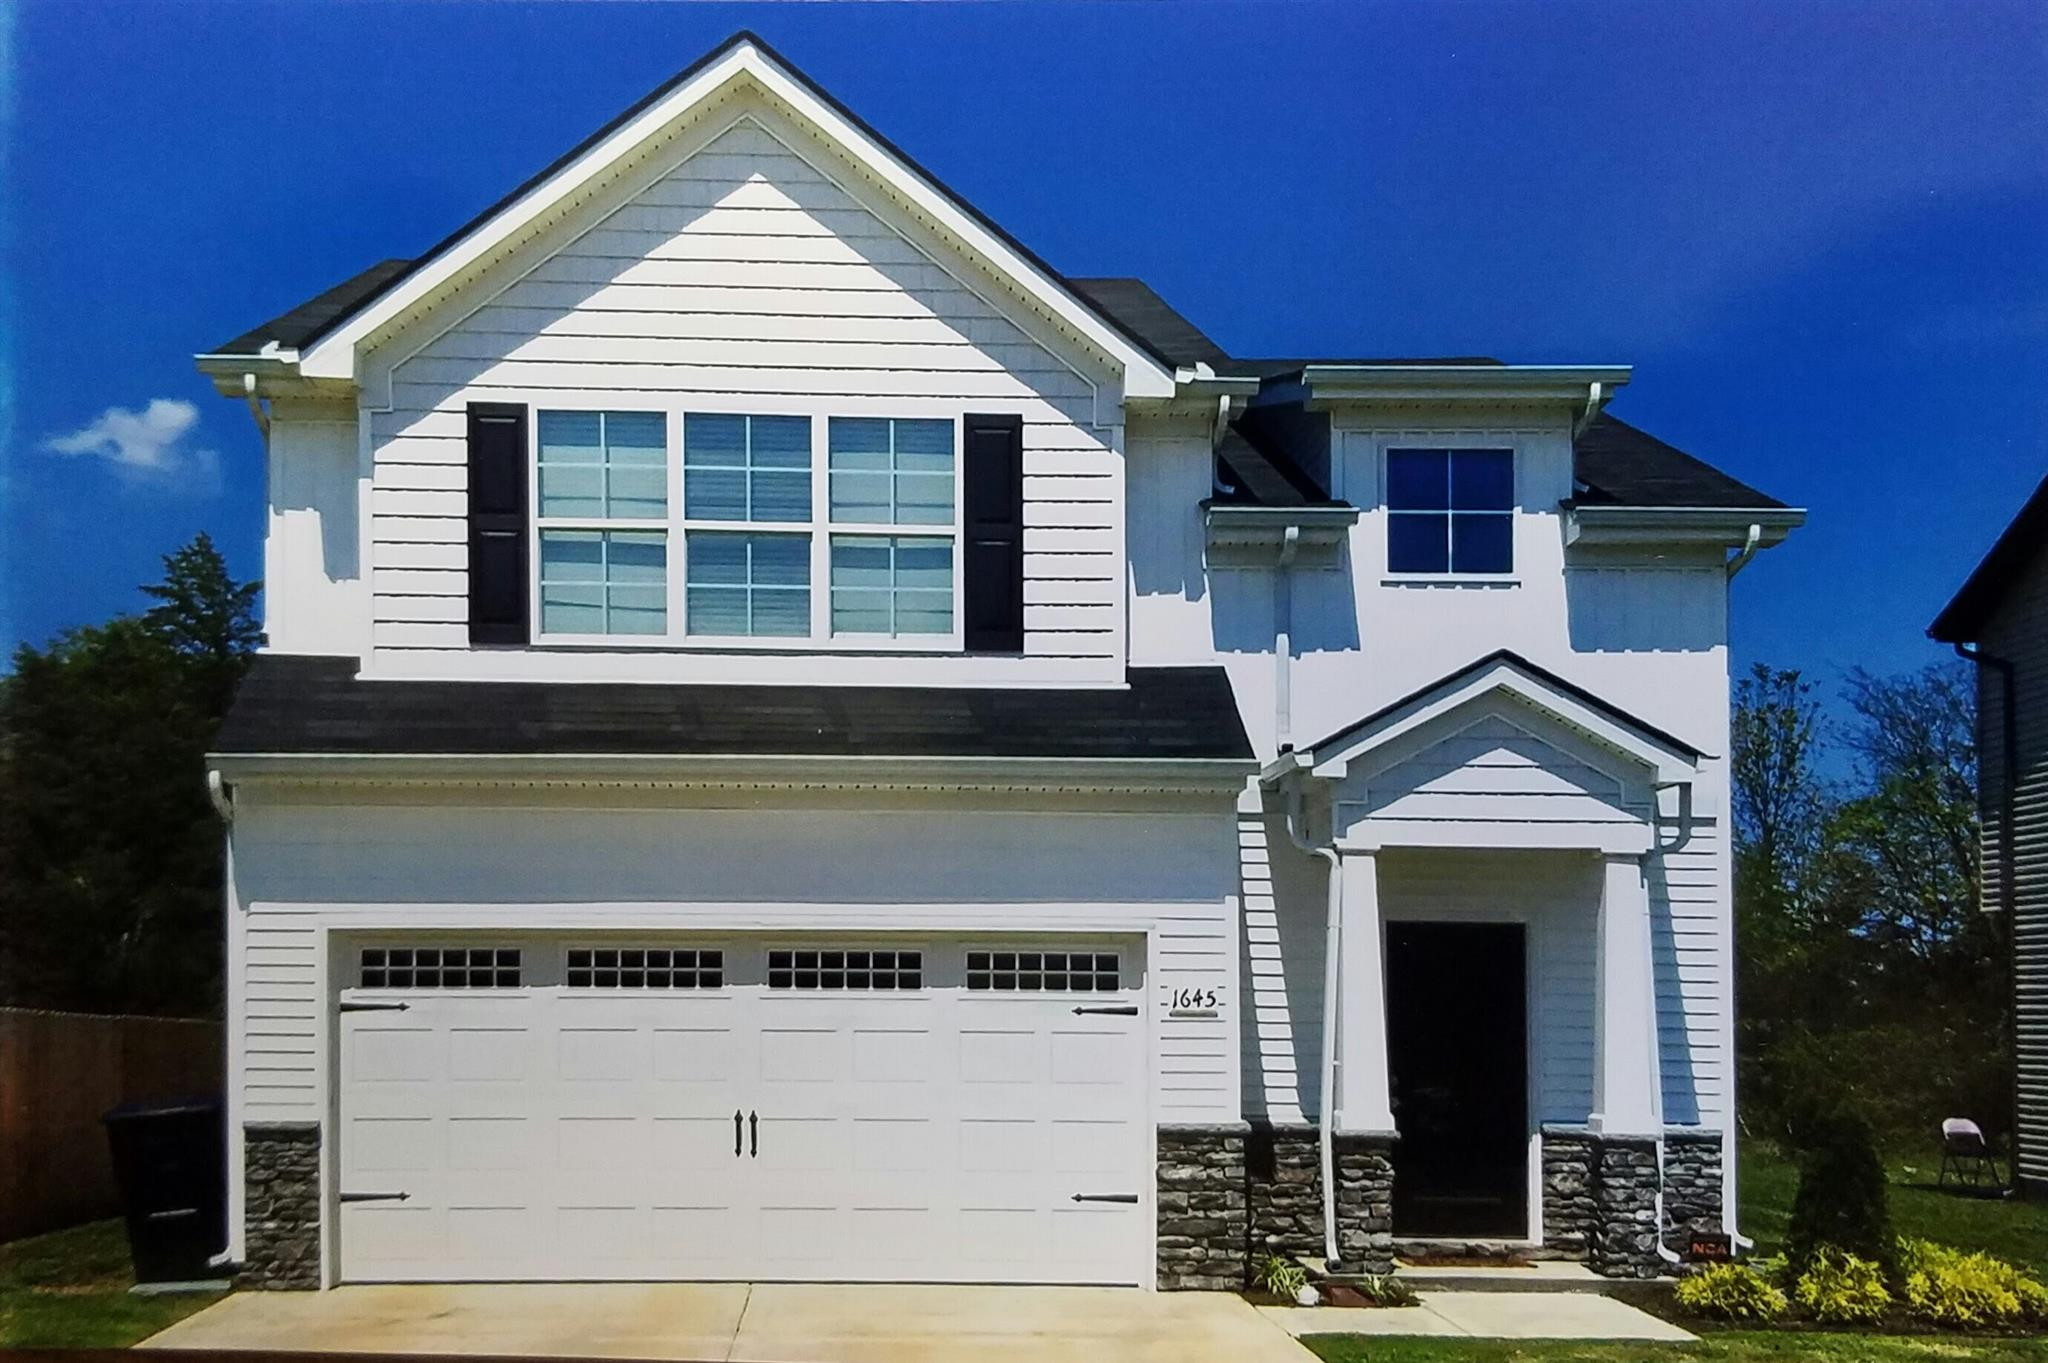 4214 Golden Sun Ct - Lot 95, Murfreesboro, TN 37127